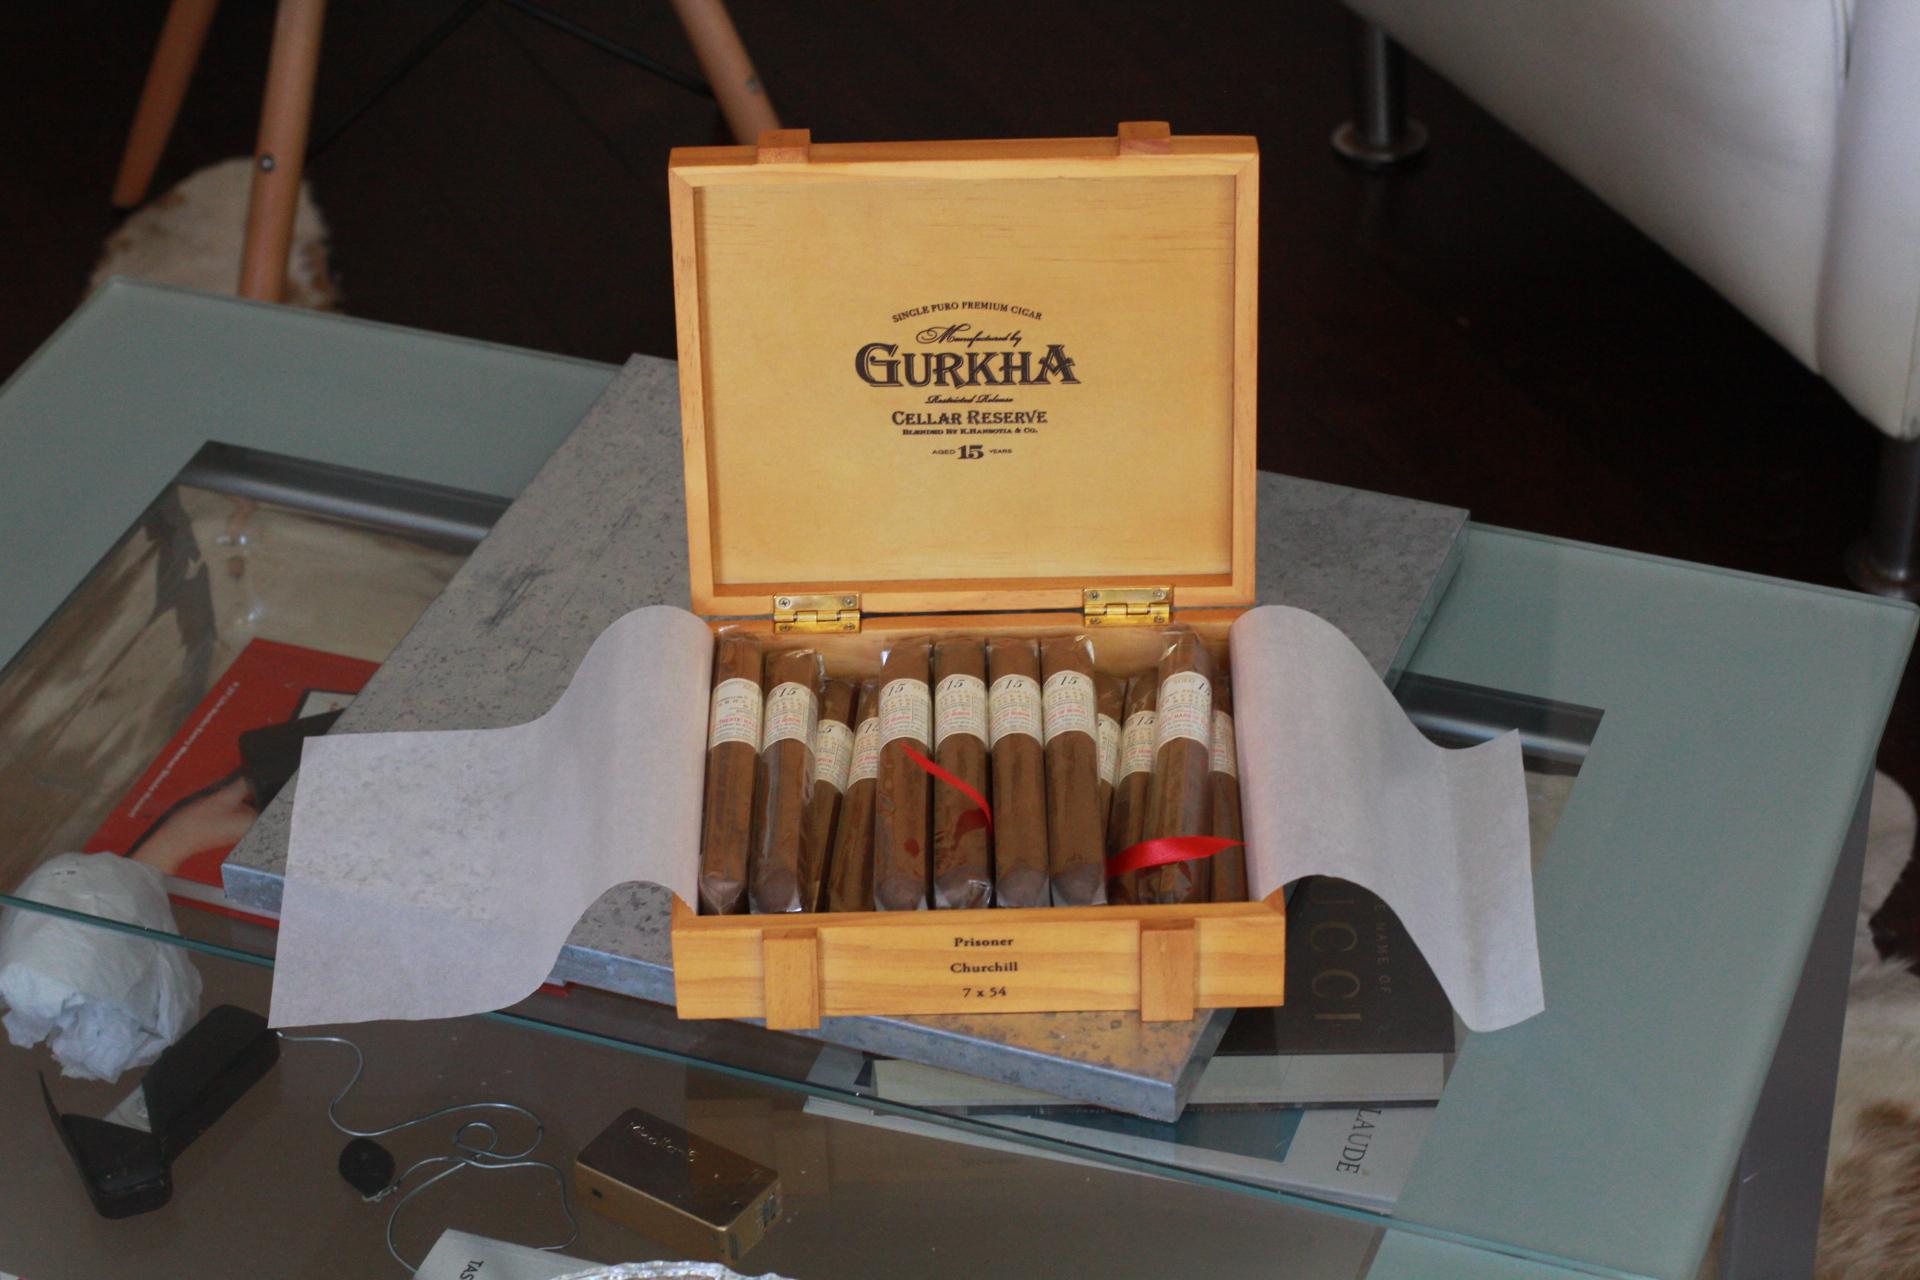 Gurkha Cigars 15 Years Cellar Reserve